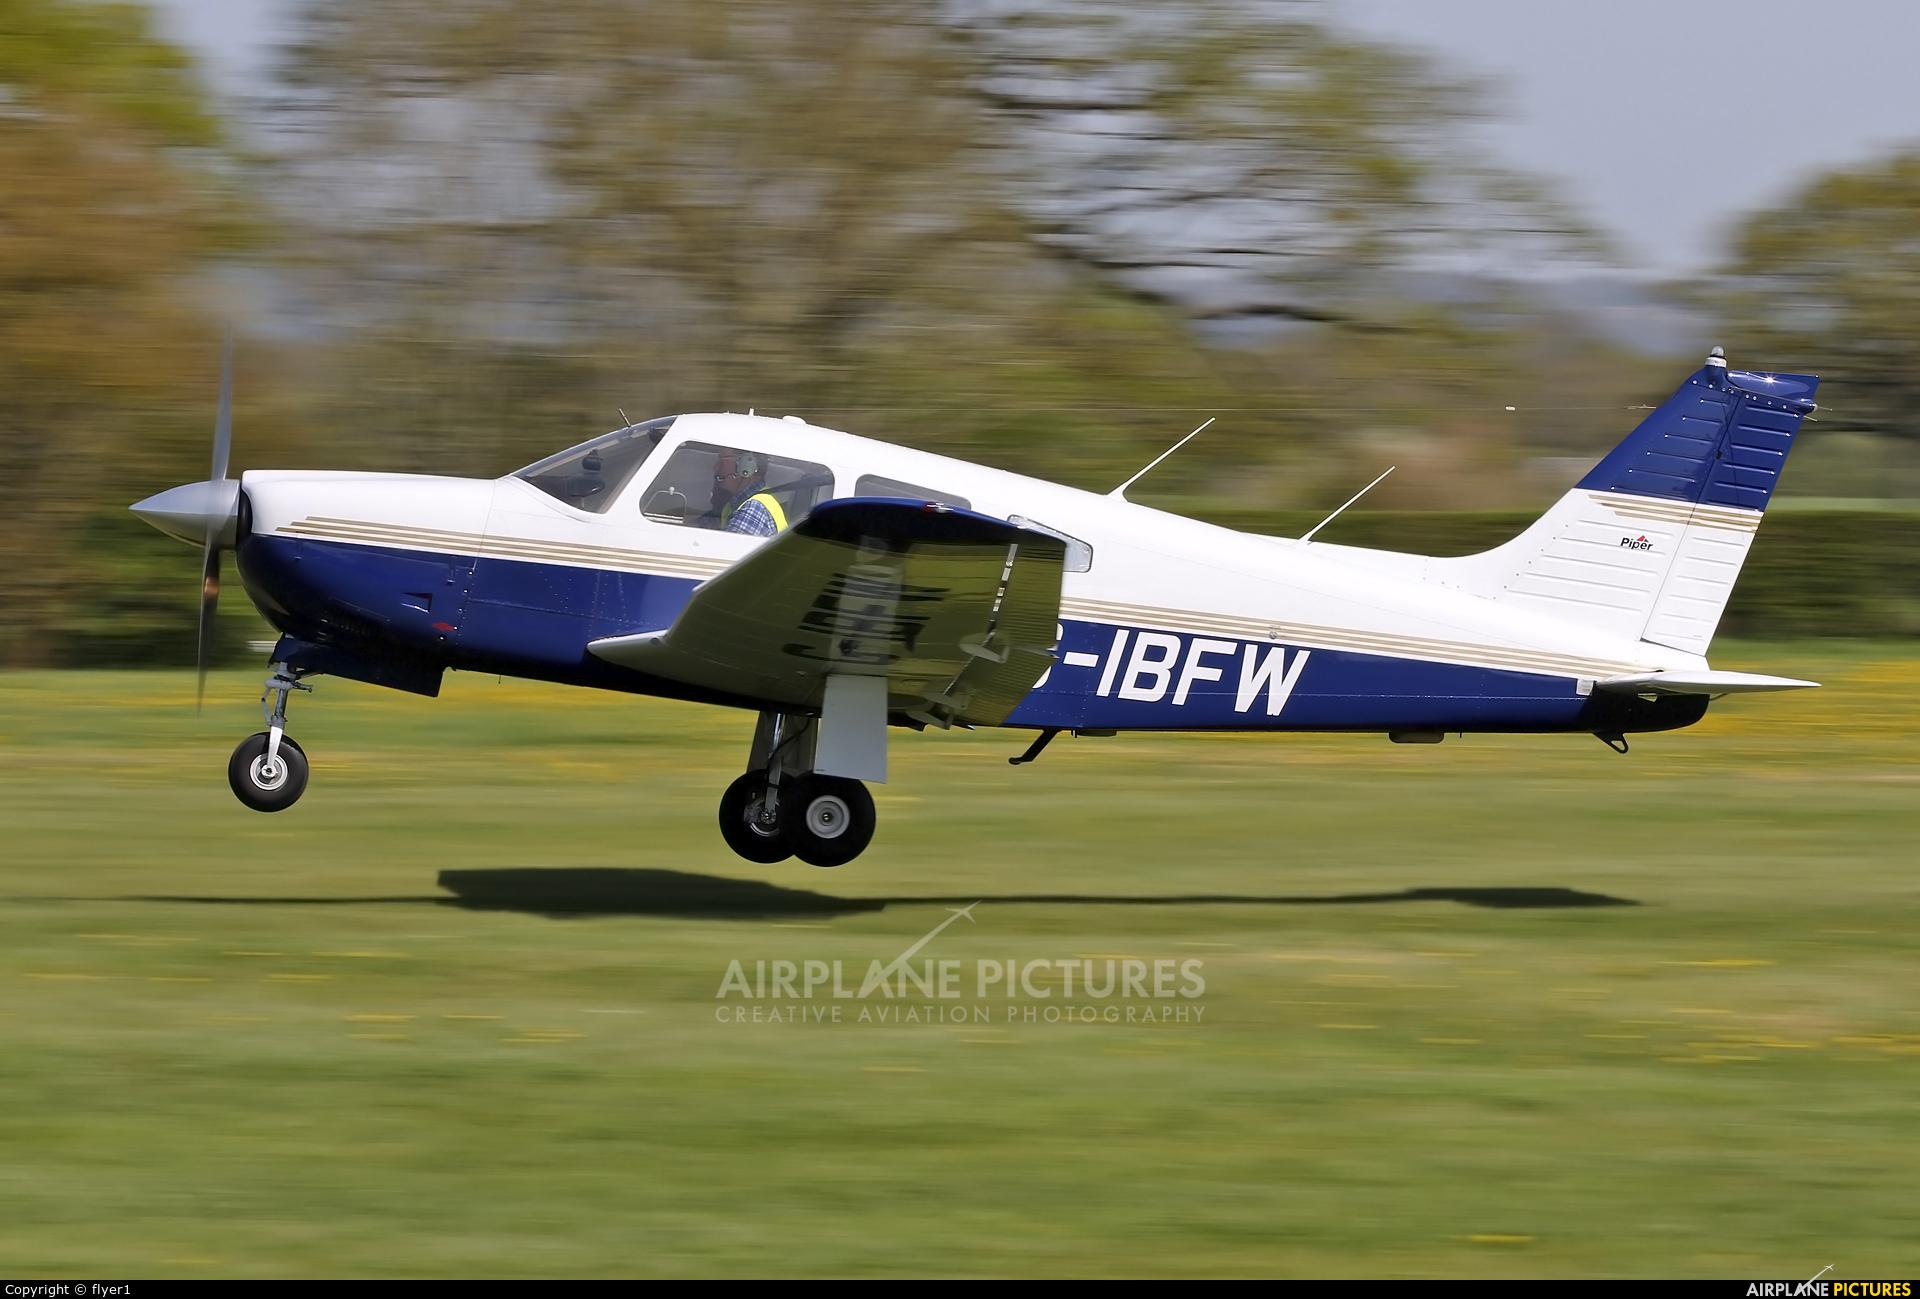 Private G-IBFW aircraft at Lashenden / Headcorn